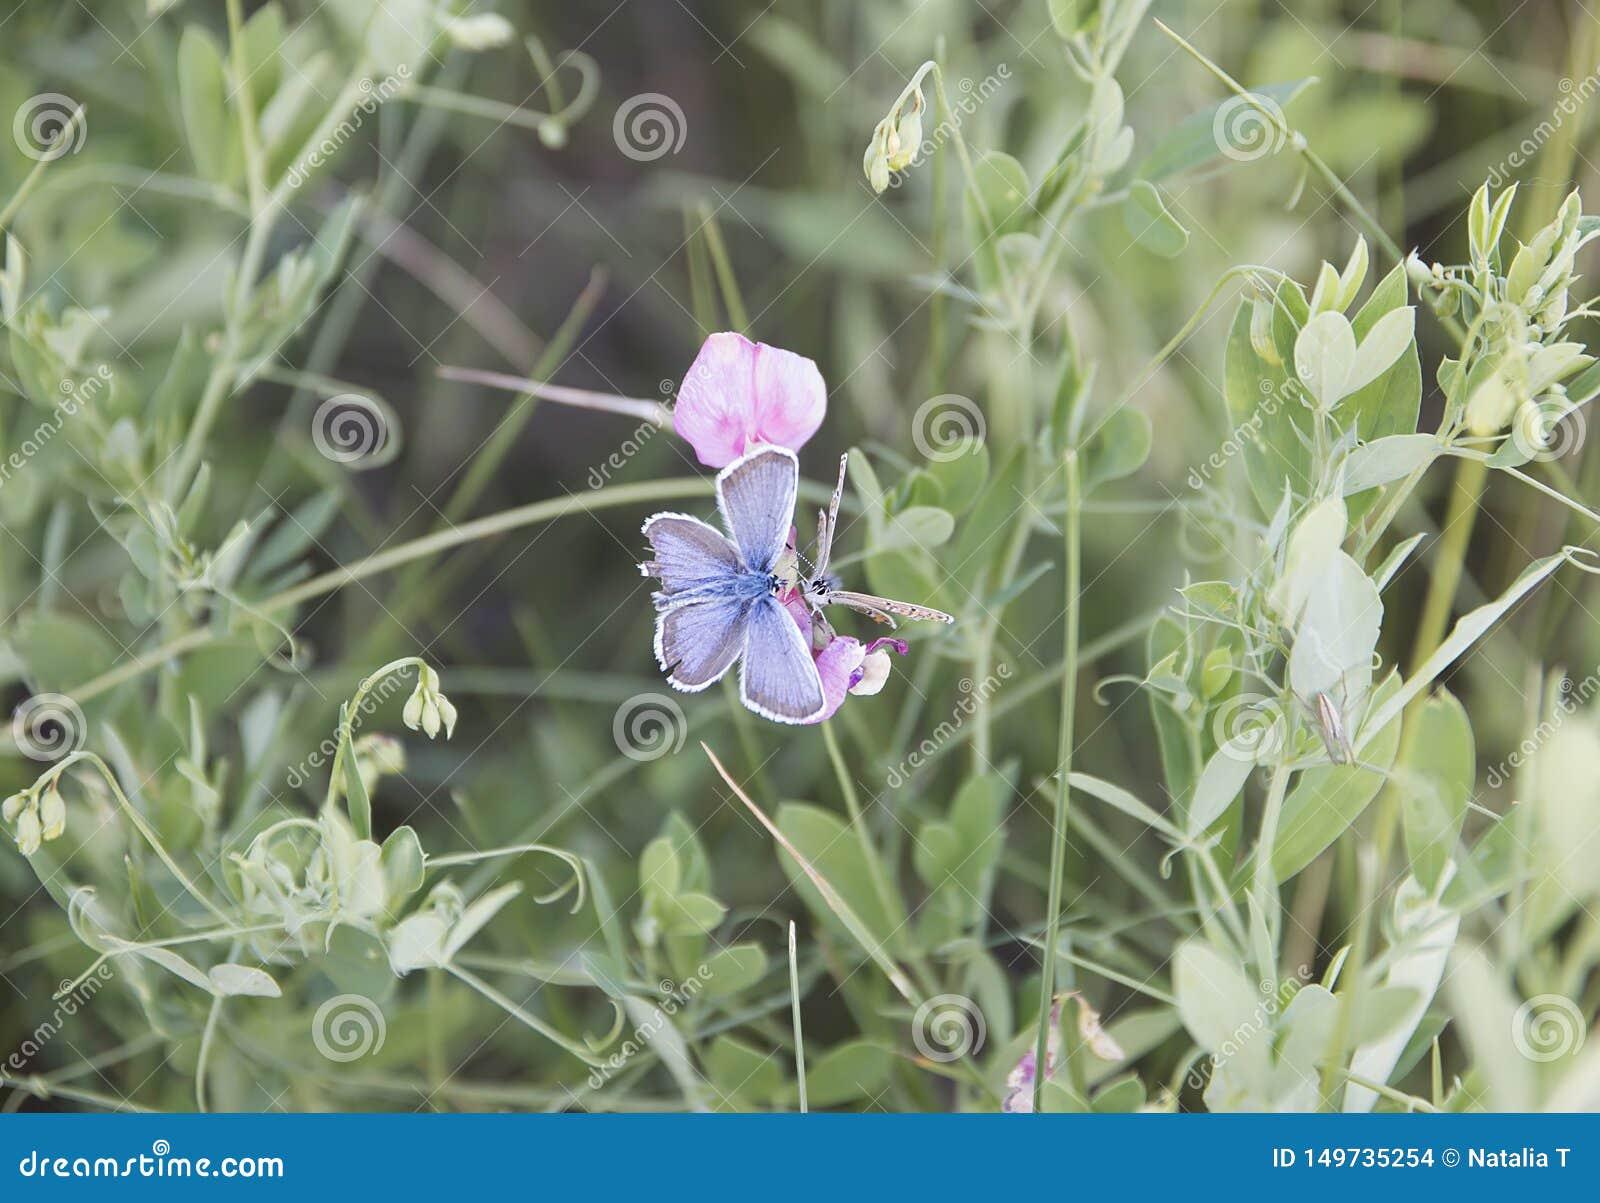 Two butterflies, sitting on a flower